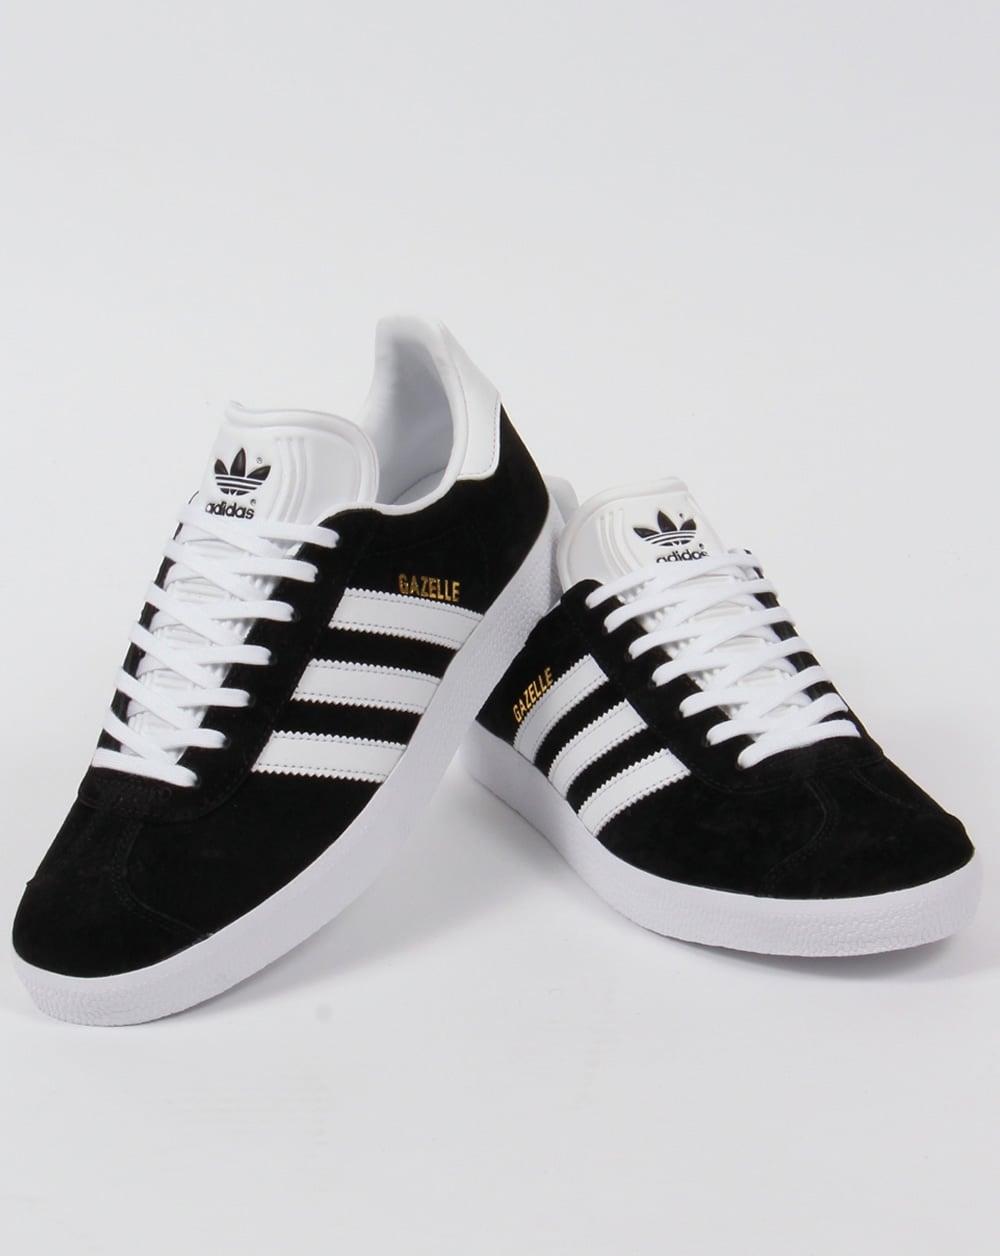 adidas Gazelle 90s black